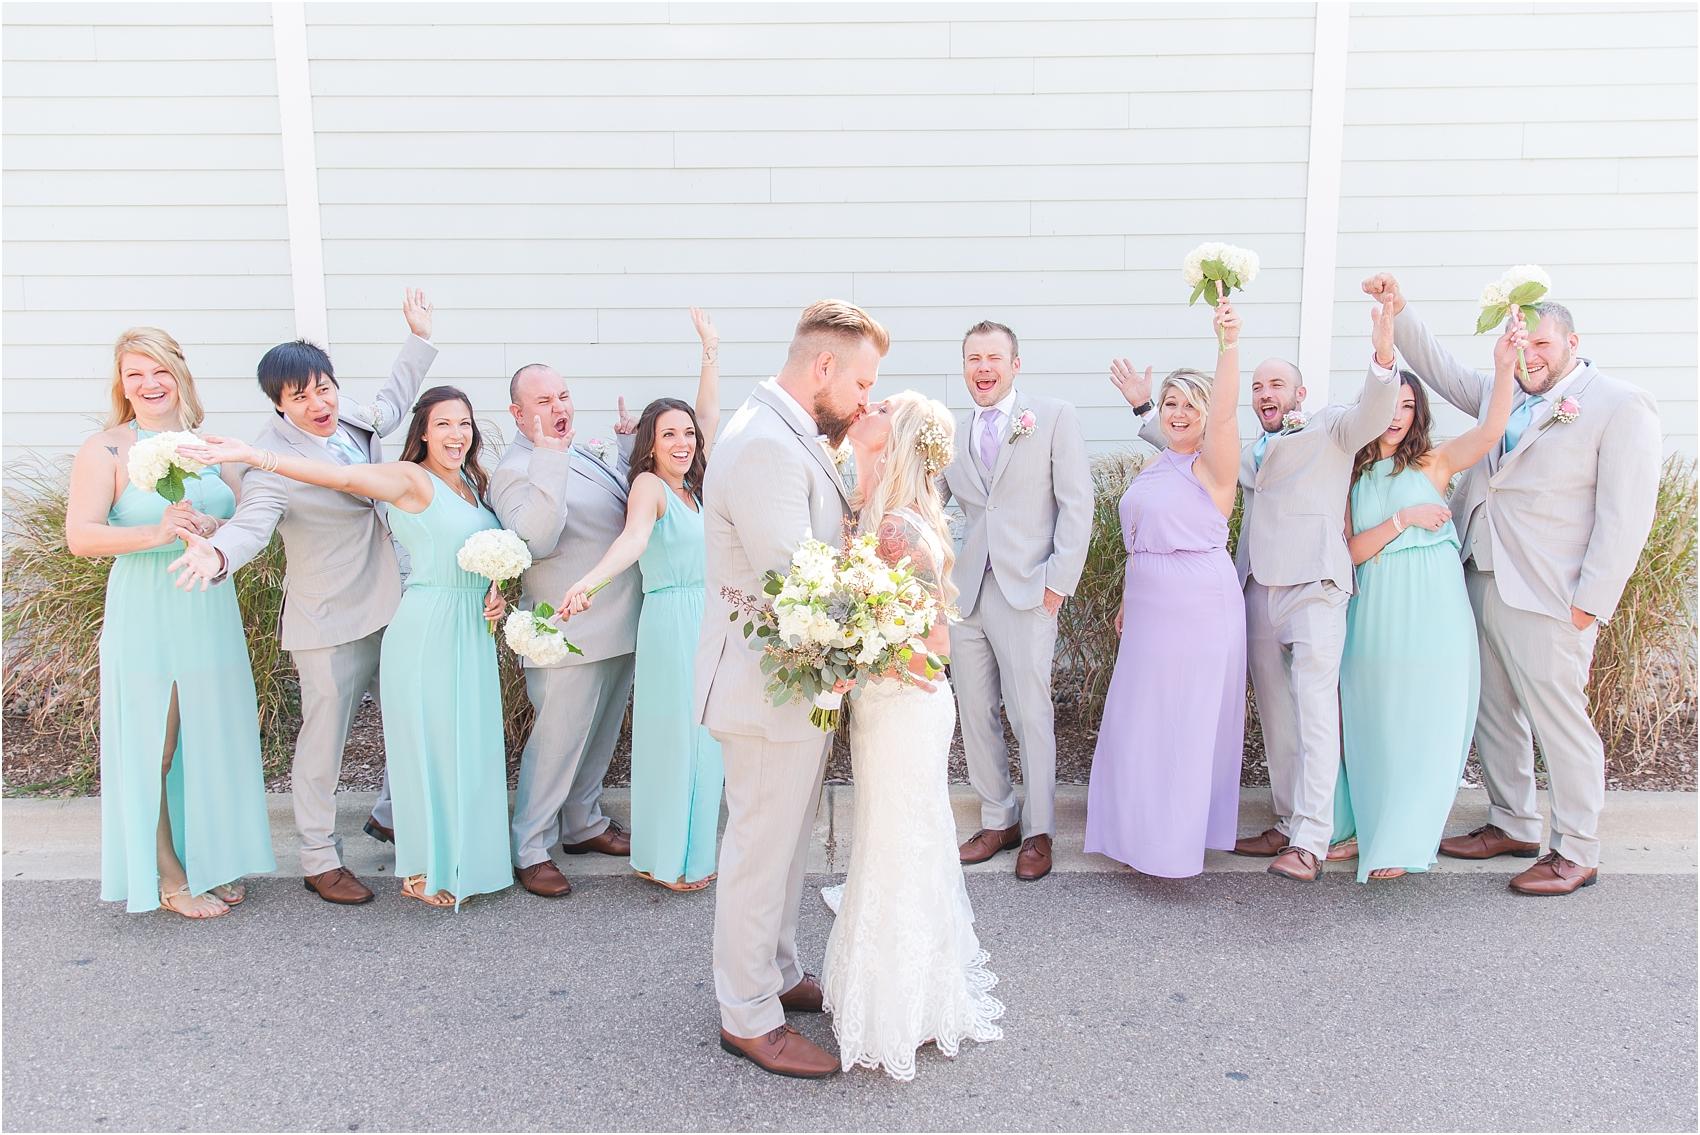 fun-whimsical-beach-wedding-photos-in-st-joseph-michigan-by-courtney-carolyn-photography_0050.jpg